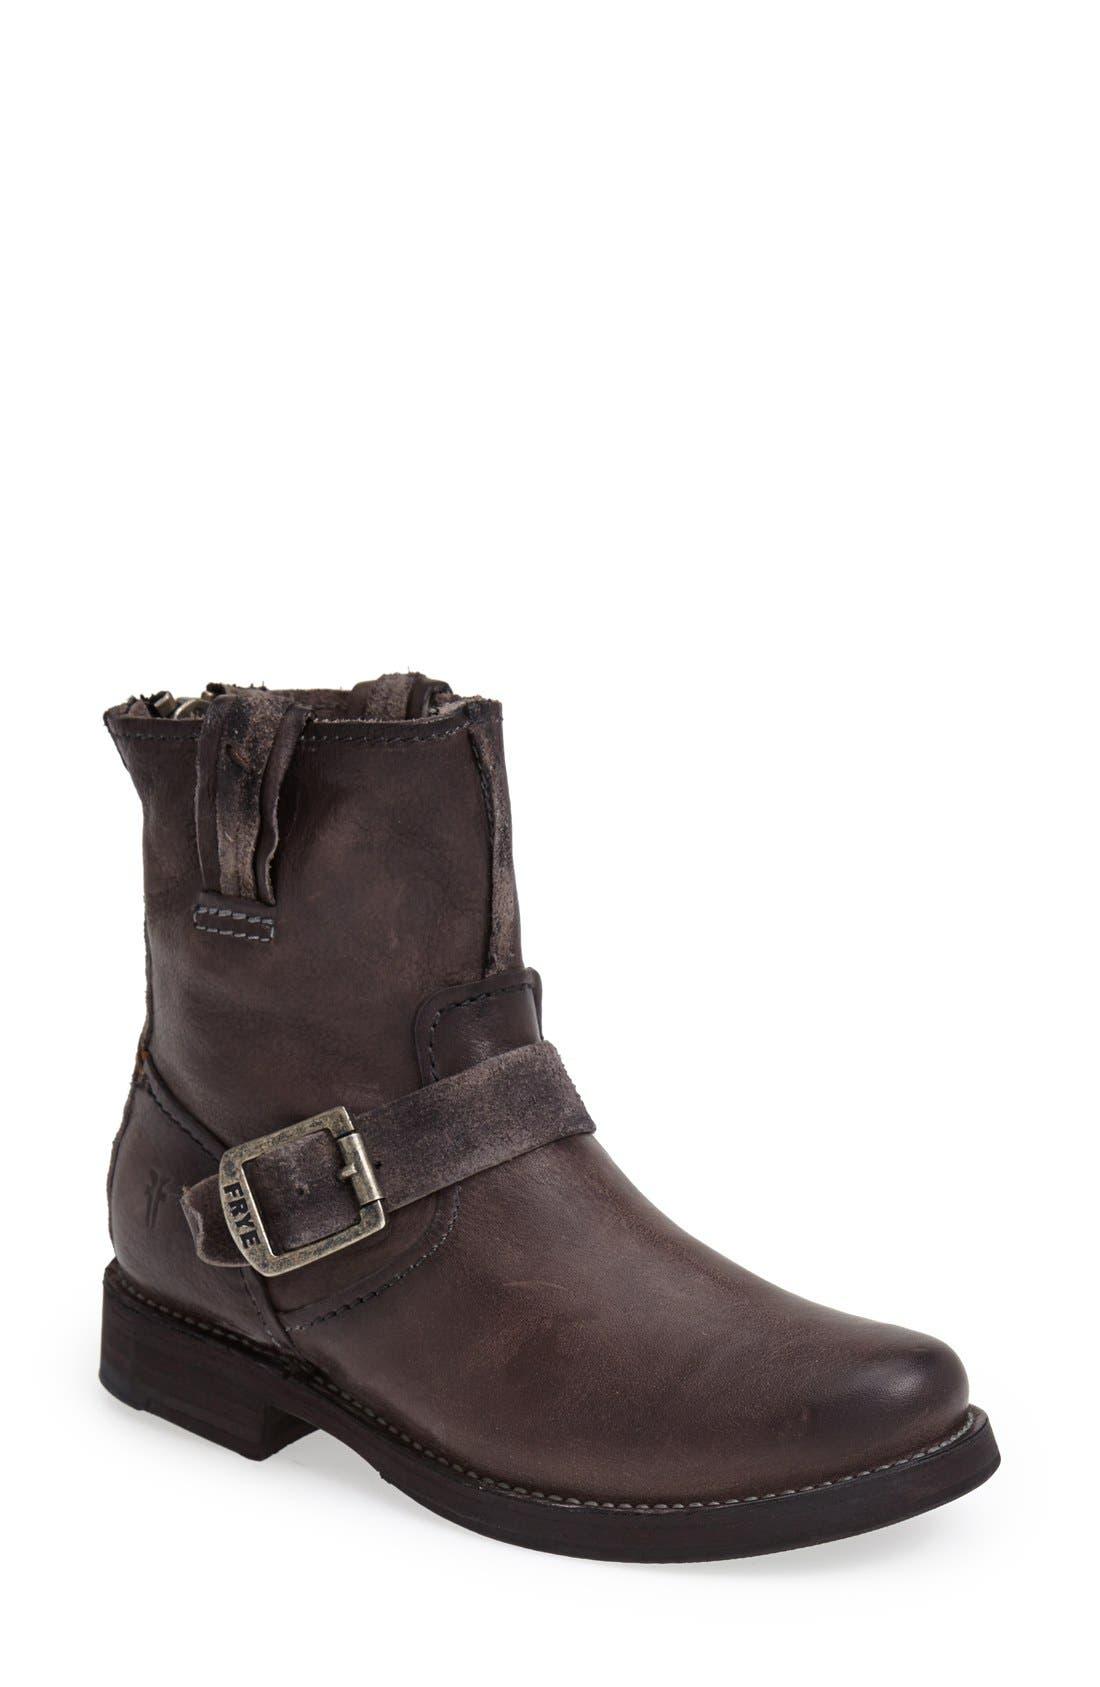 Alternate Image 1 Selected - Frye 'Vicky Artisan' Back Zip Boot (Women)